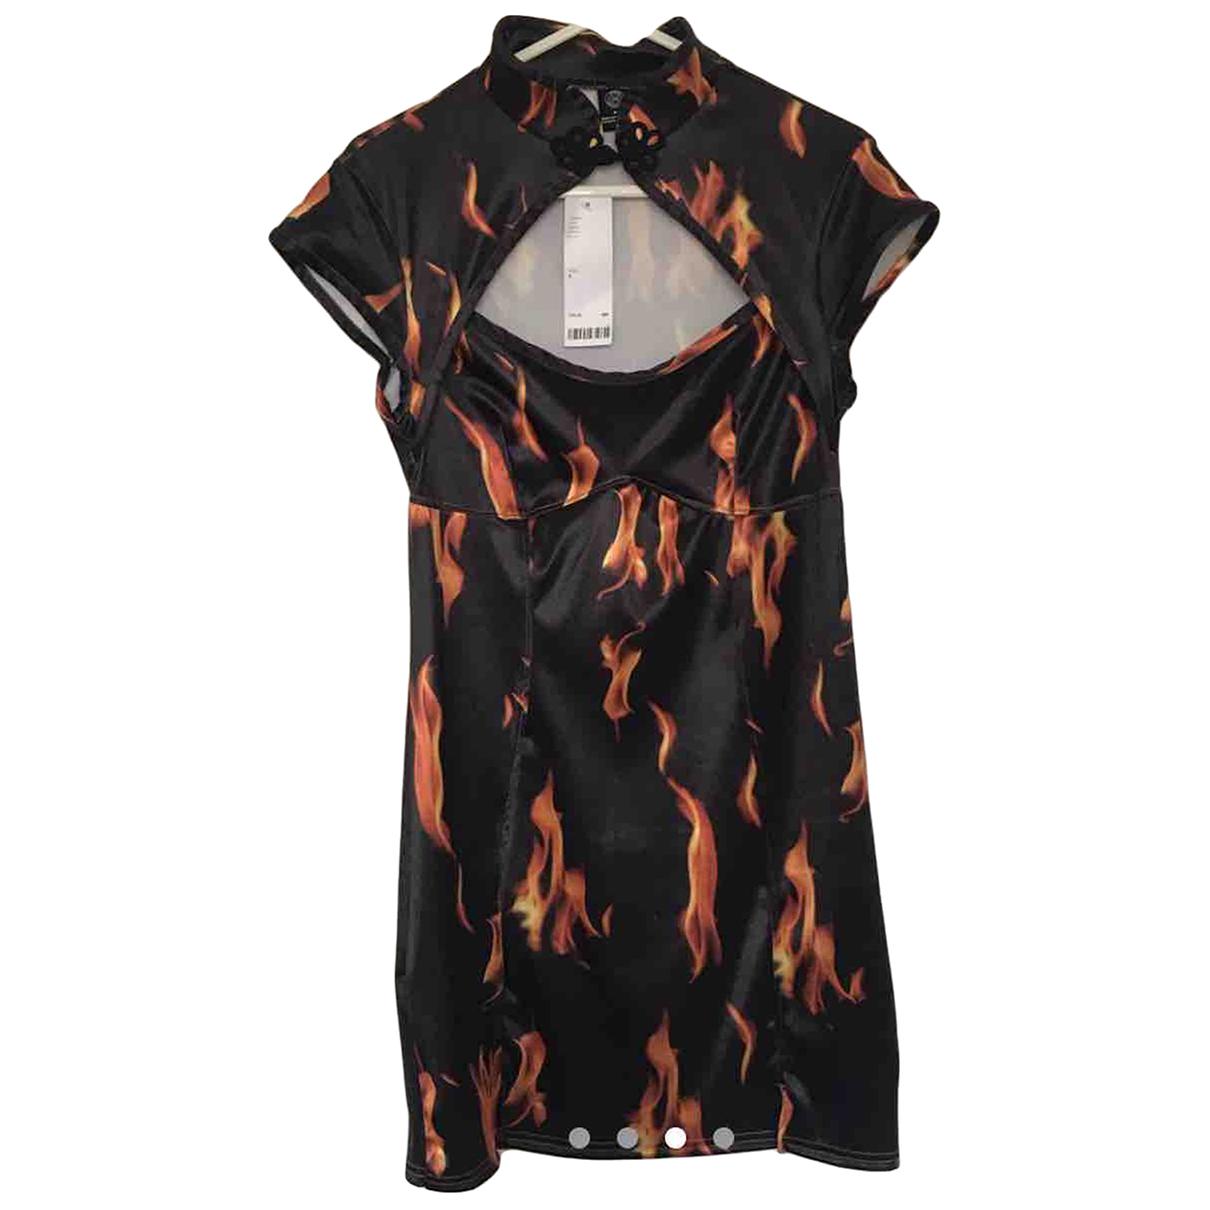 Urban Outfitters \N Kleid in  Schwarz Polyester